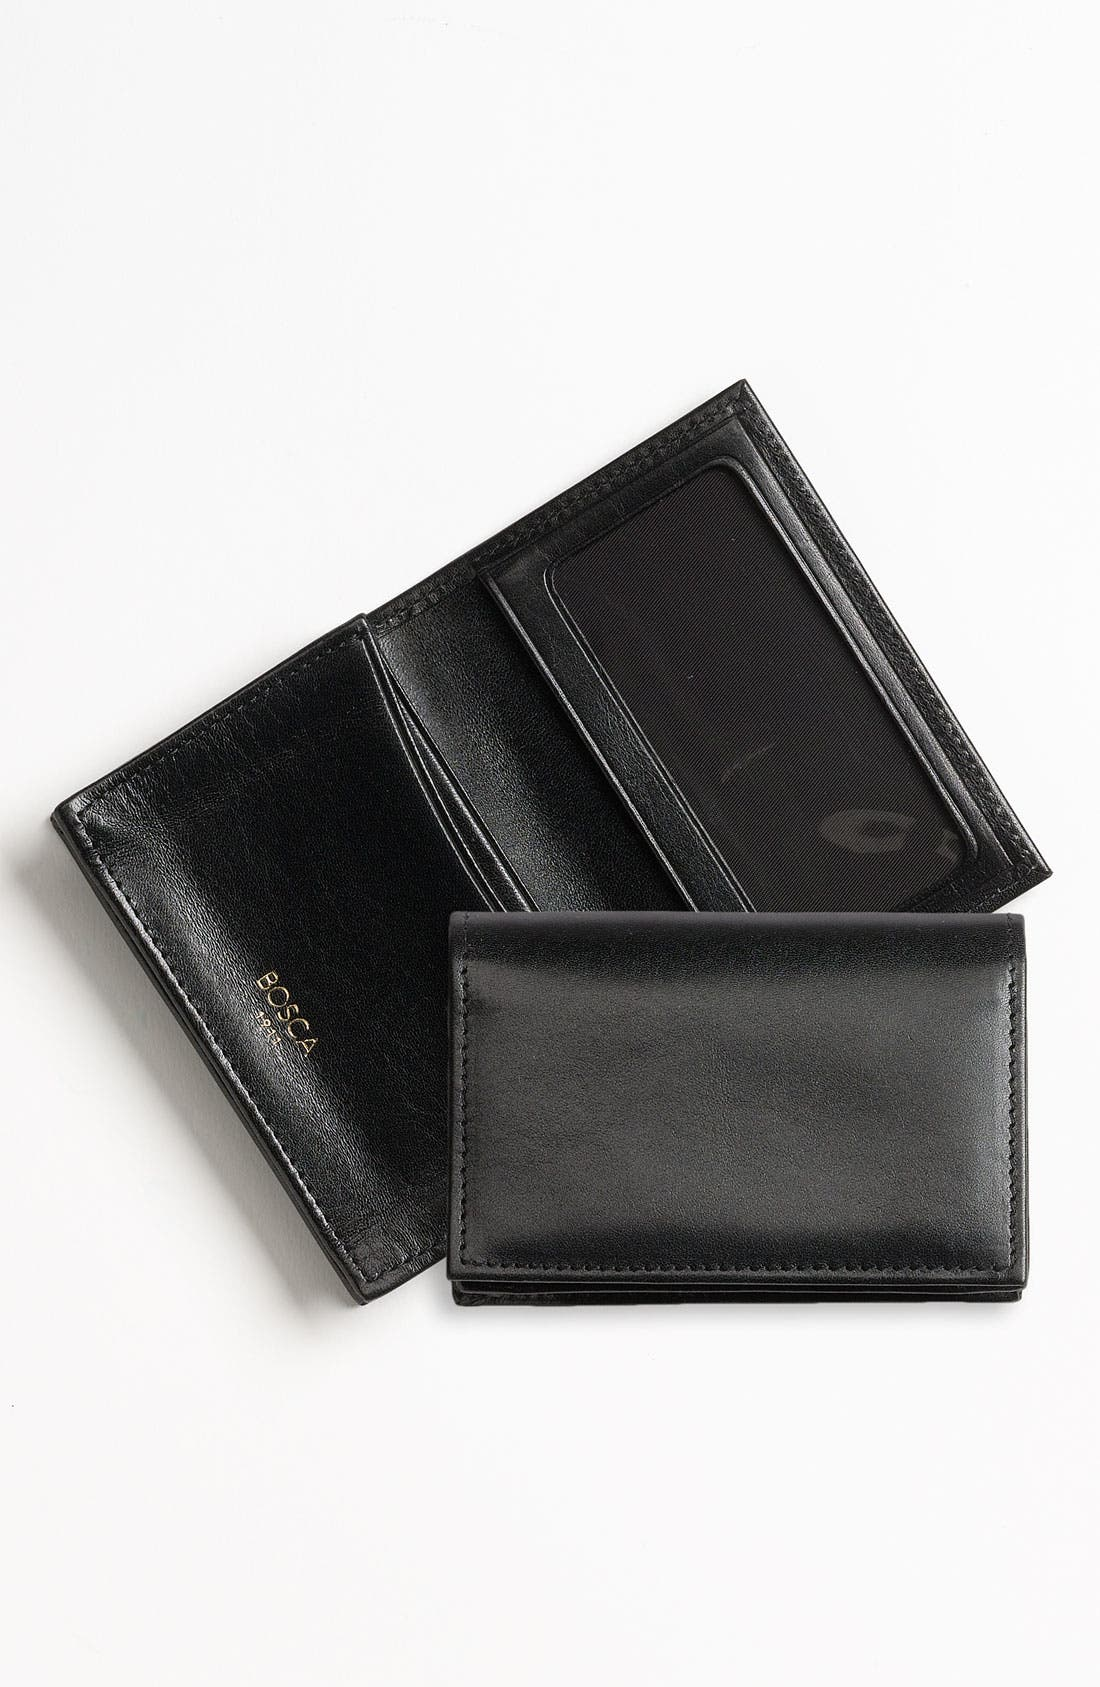 'Old Leather' Gusset Wallet,                         Main,                         color, Black